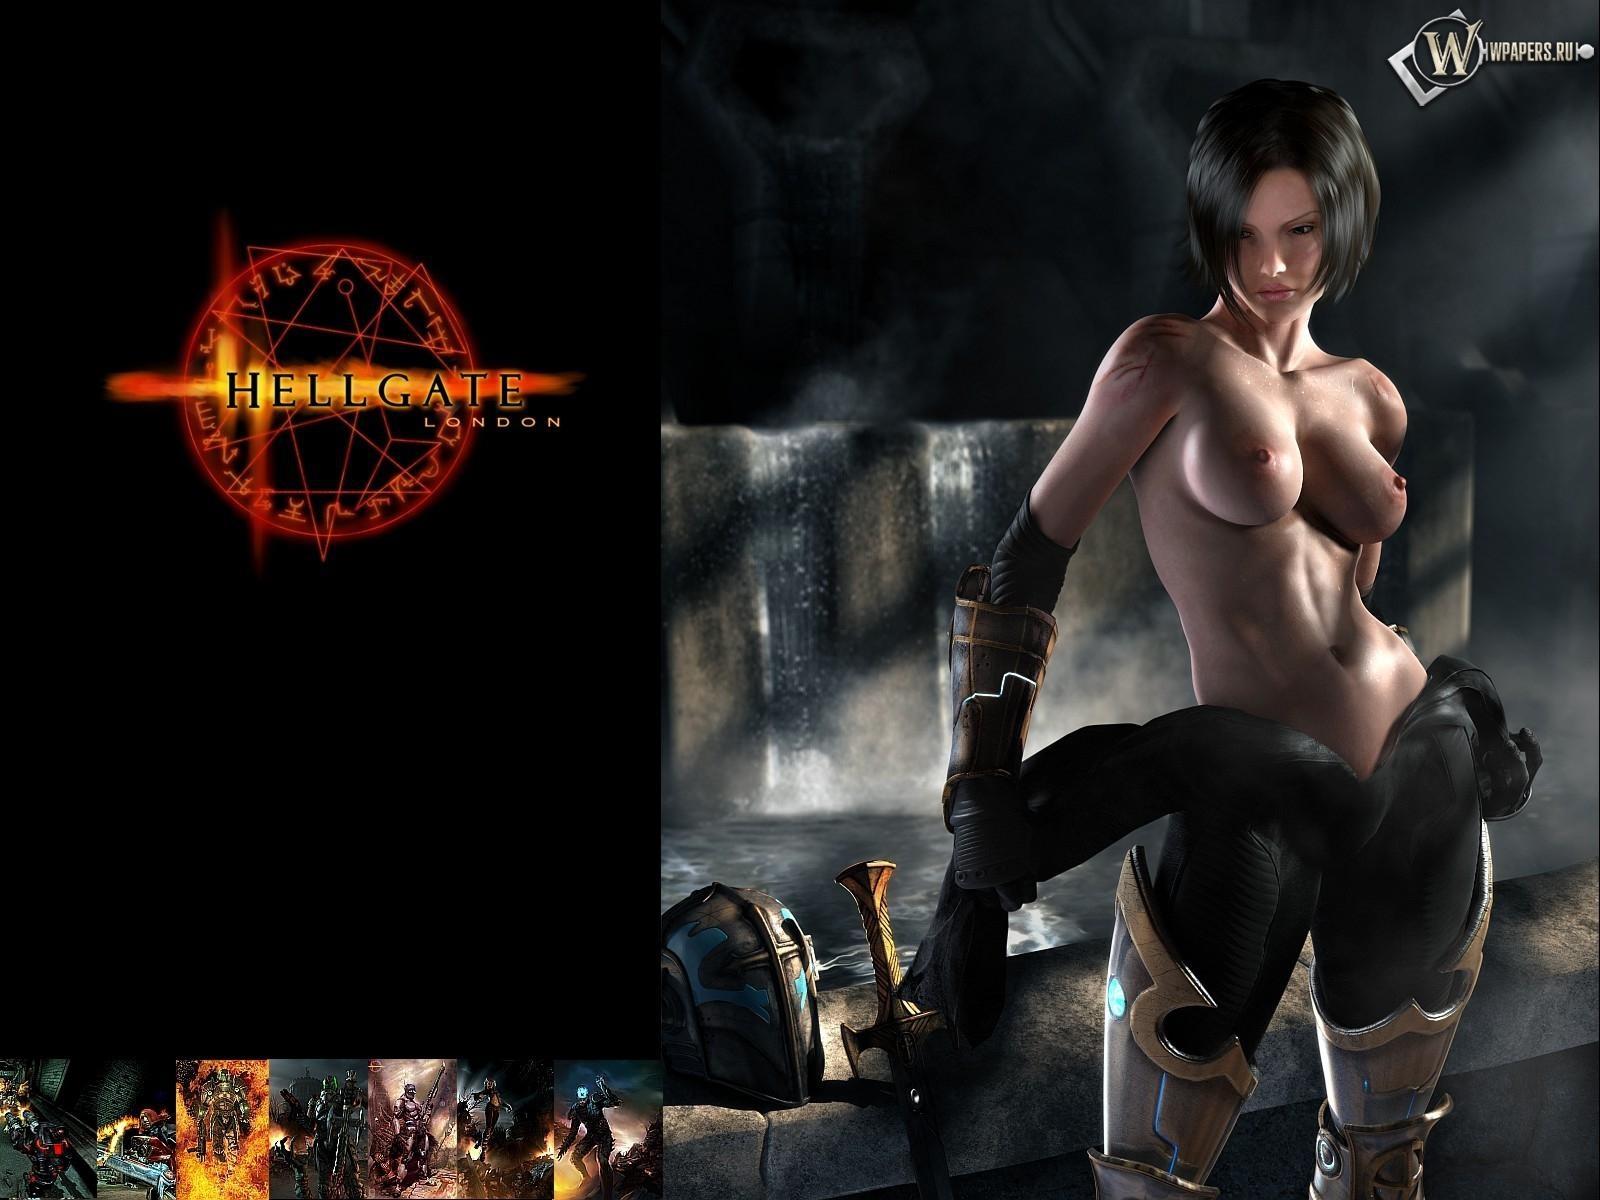 domashnie-porno-foto-sign-html